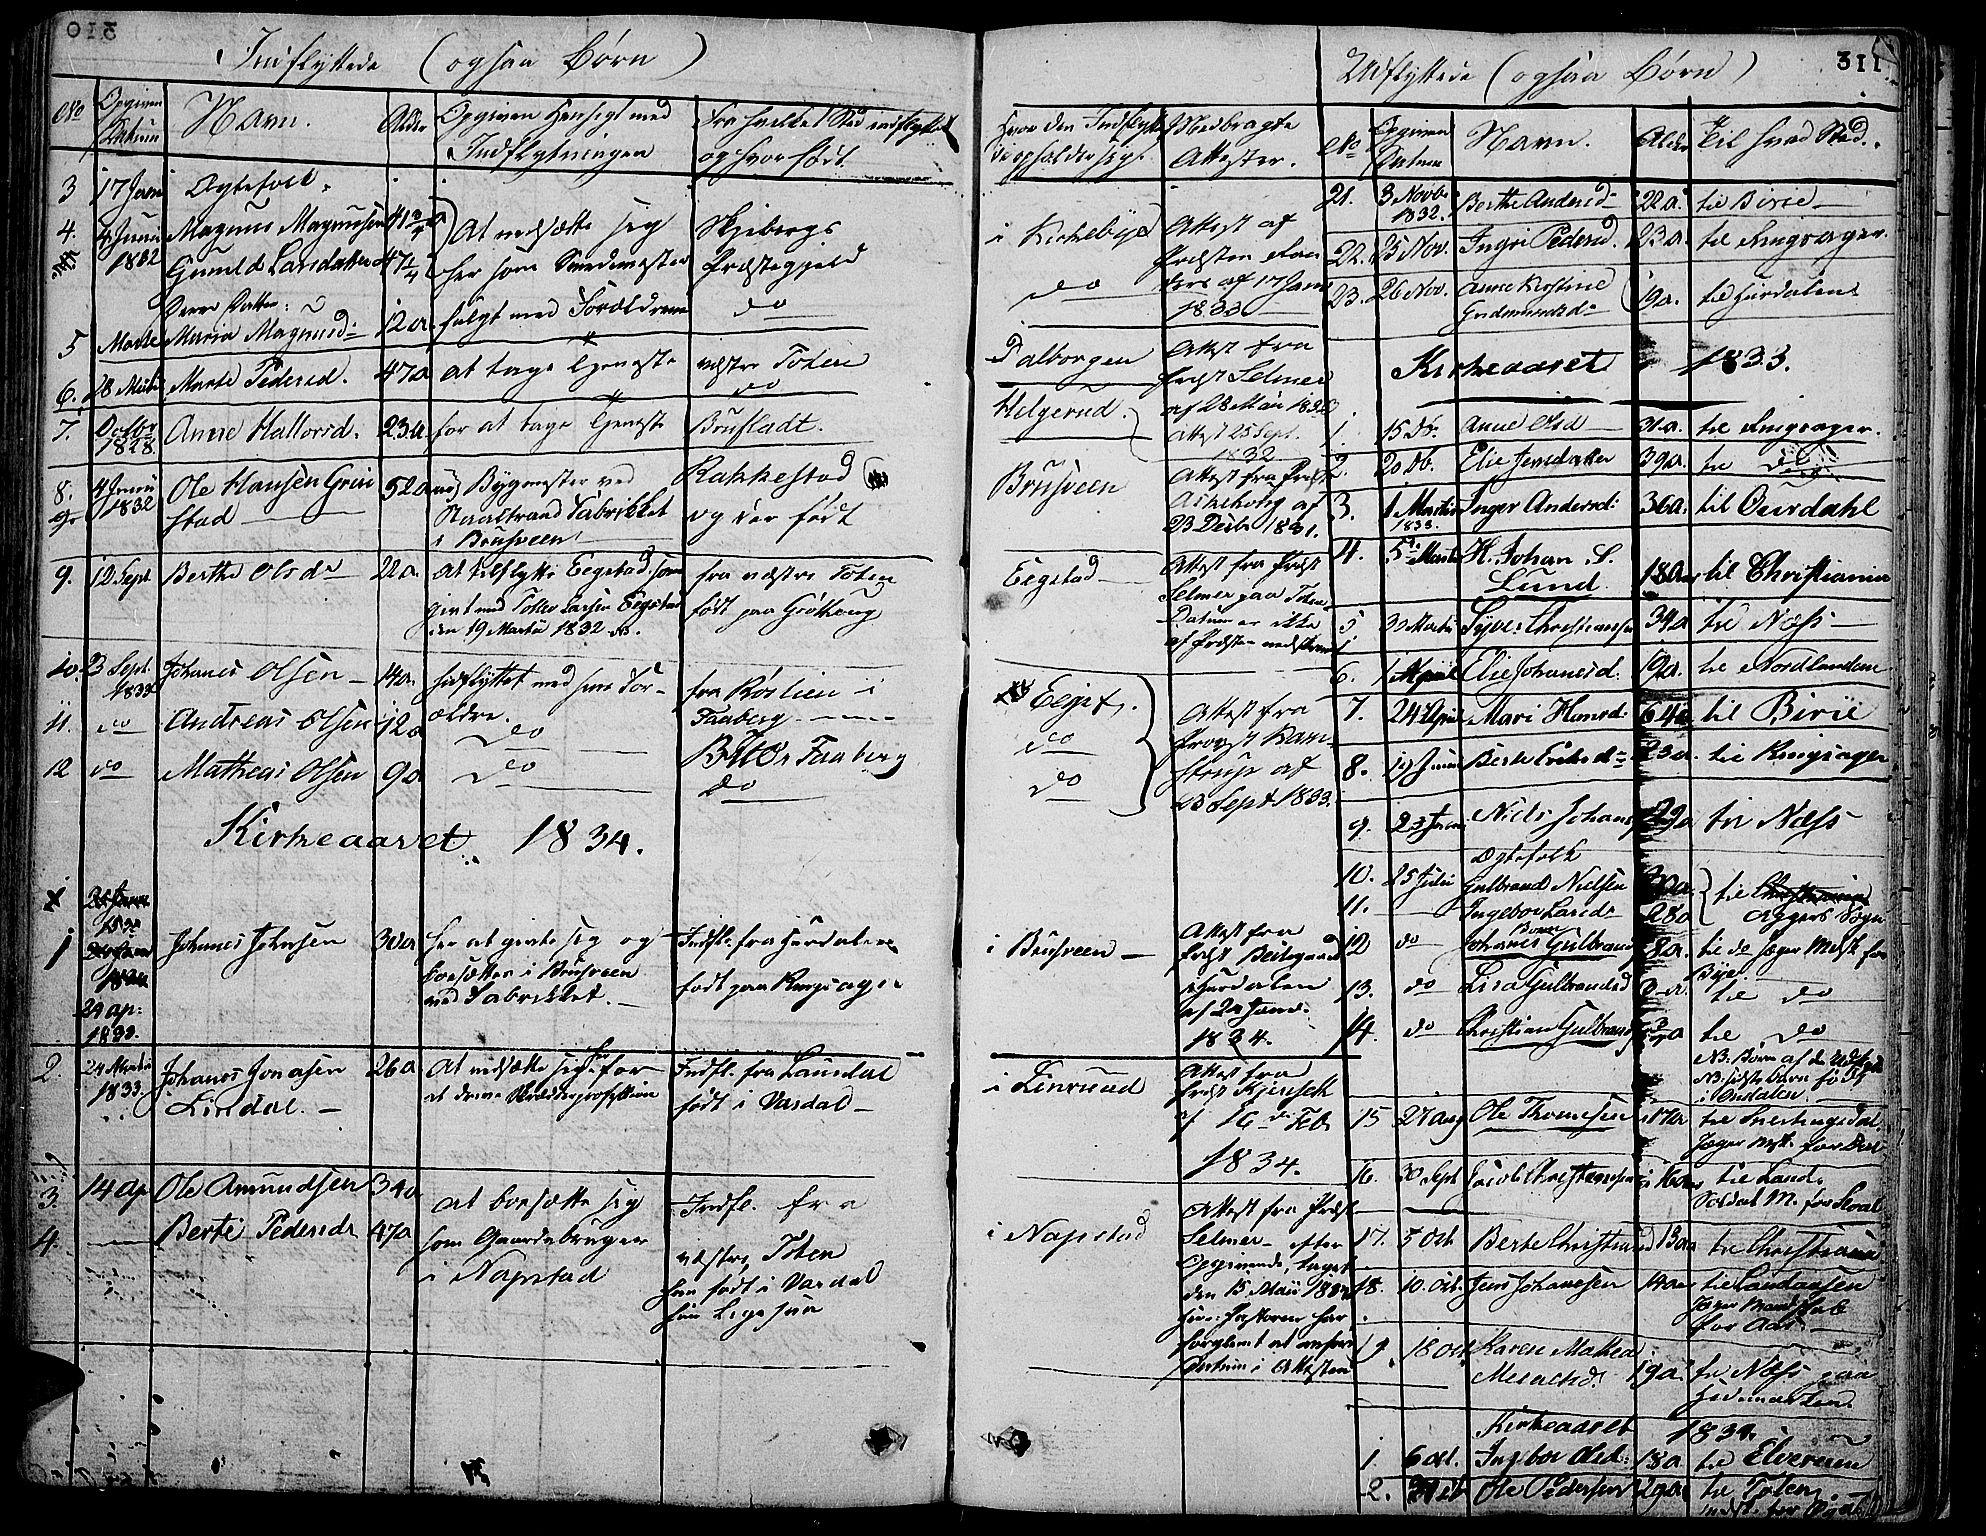 SAH, Vardal prestekontor, H/Ha/Hab/L0004: Klokkerbok nr. 4, 1831-1853, s. 311